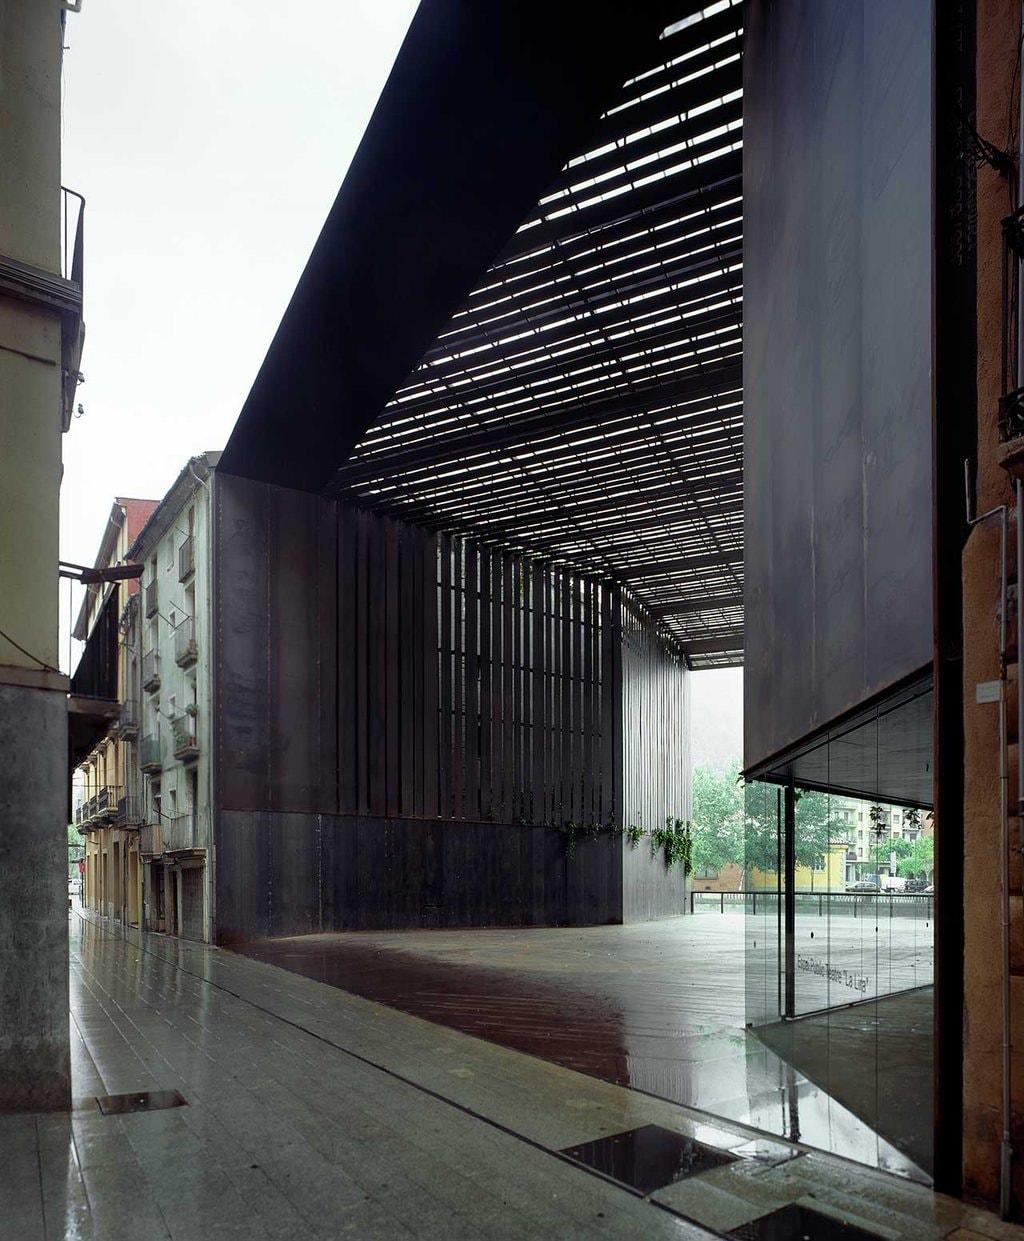 European Prize for Public Space 2014